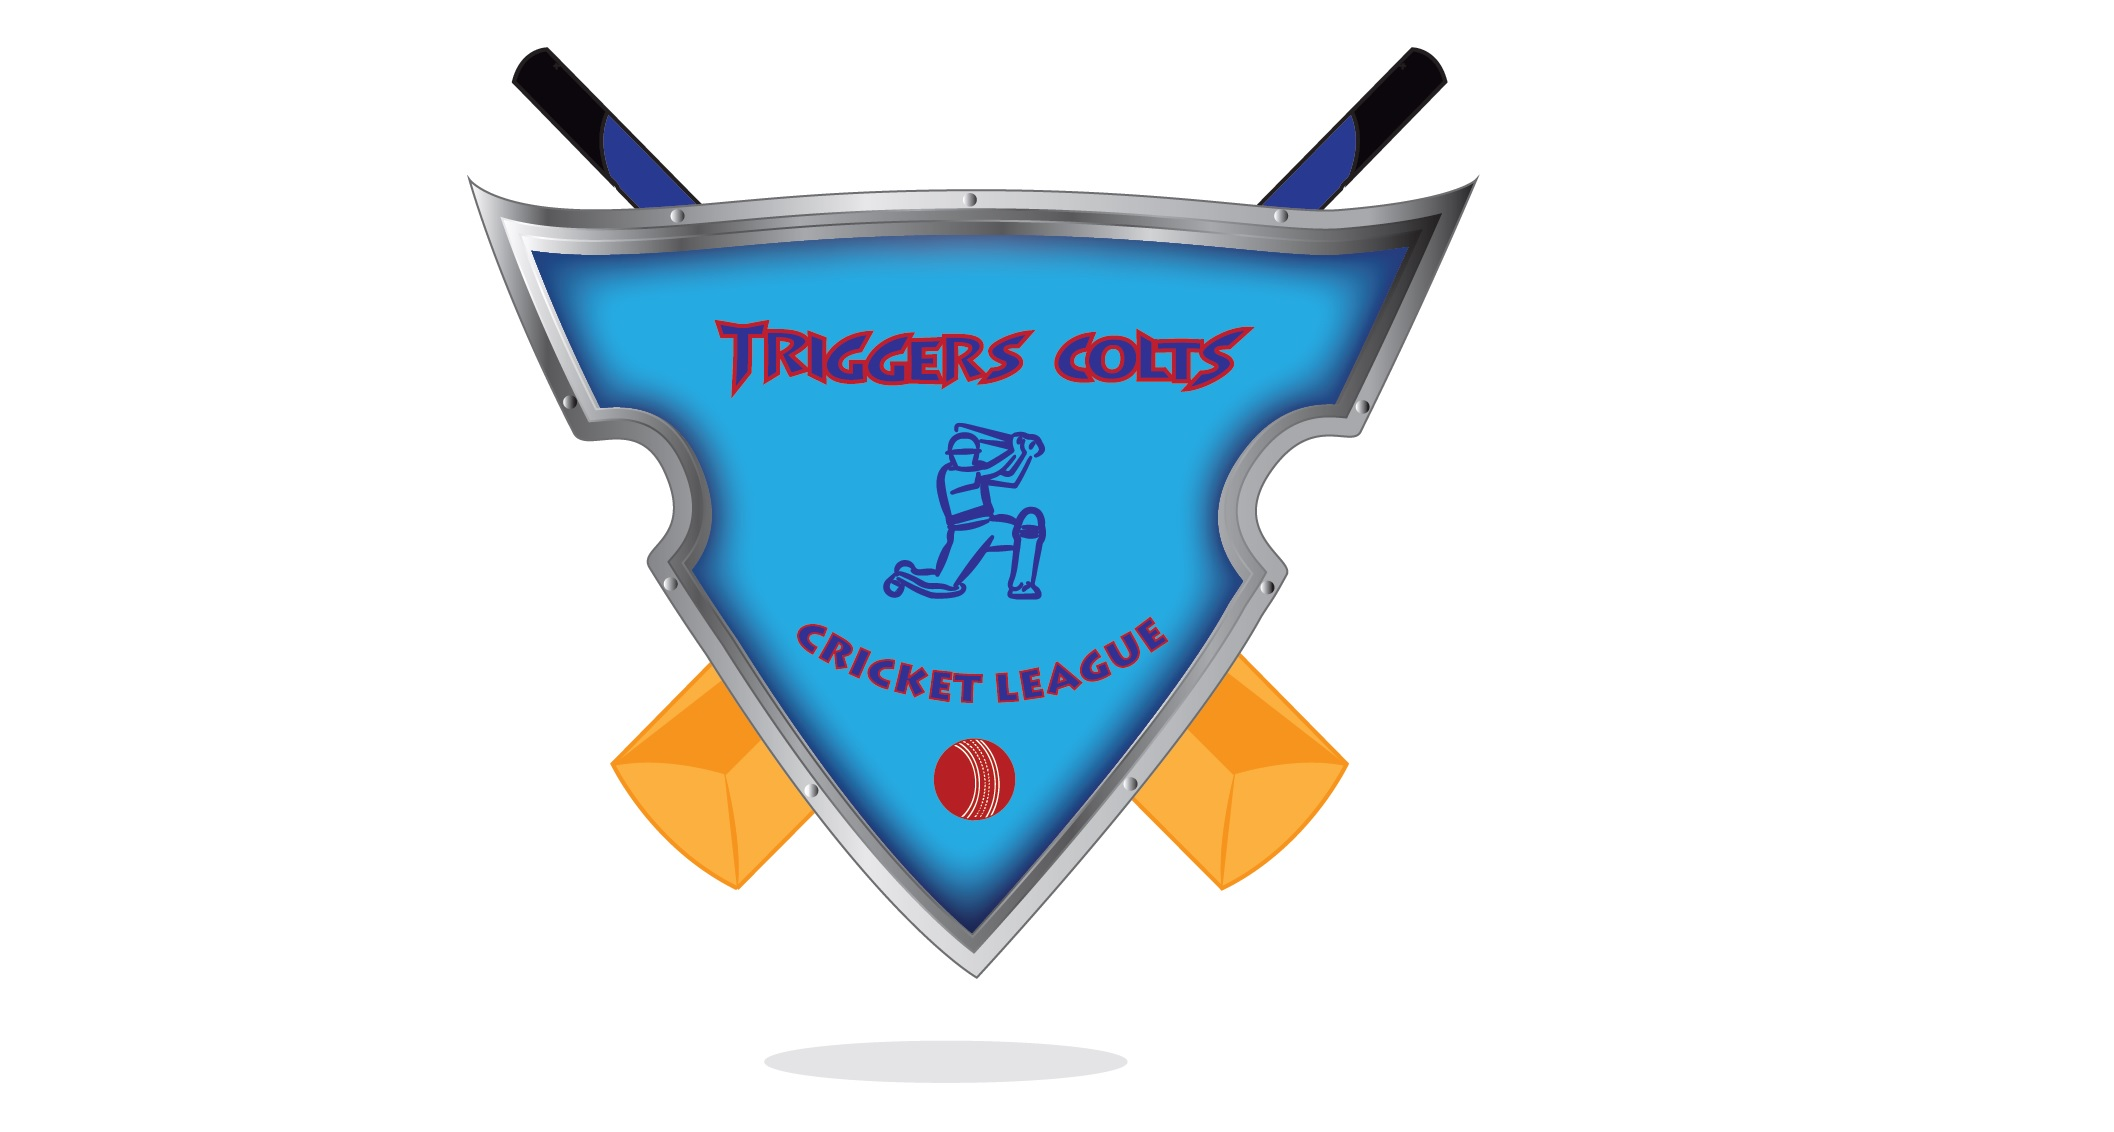 Triggers Colts Cricket League Cricket